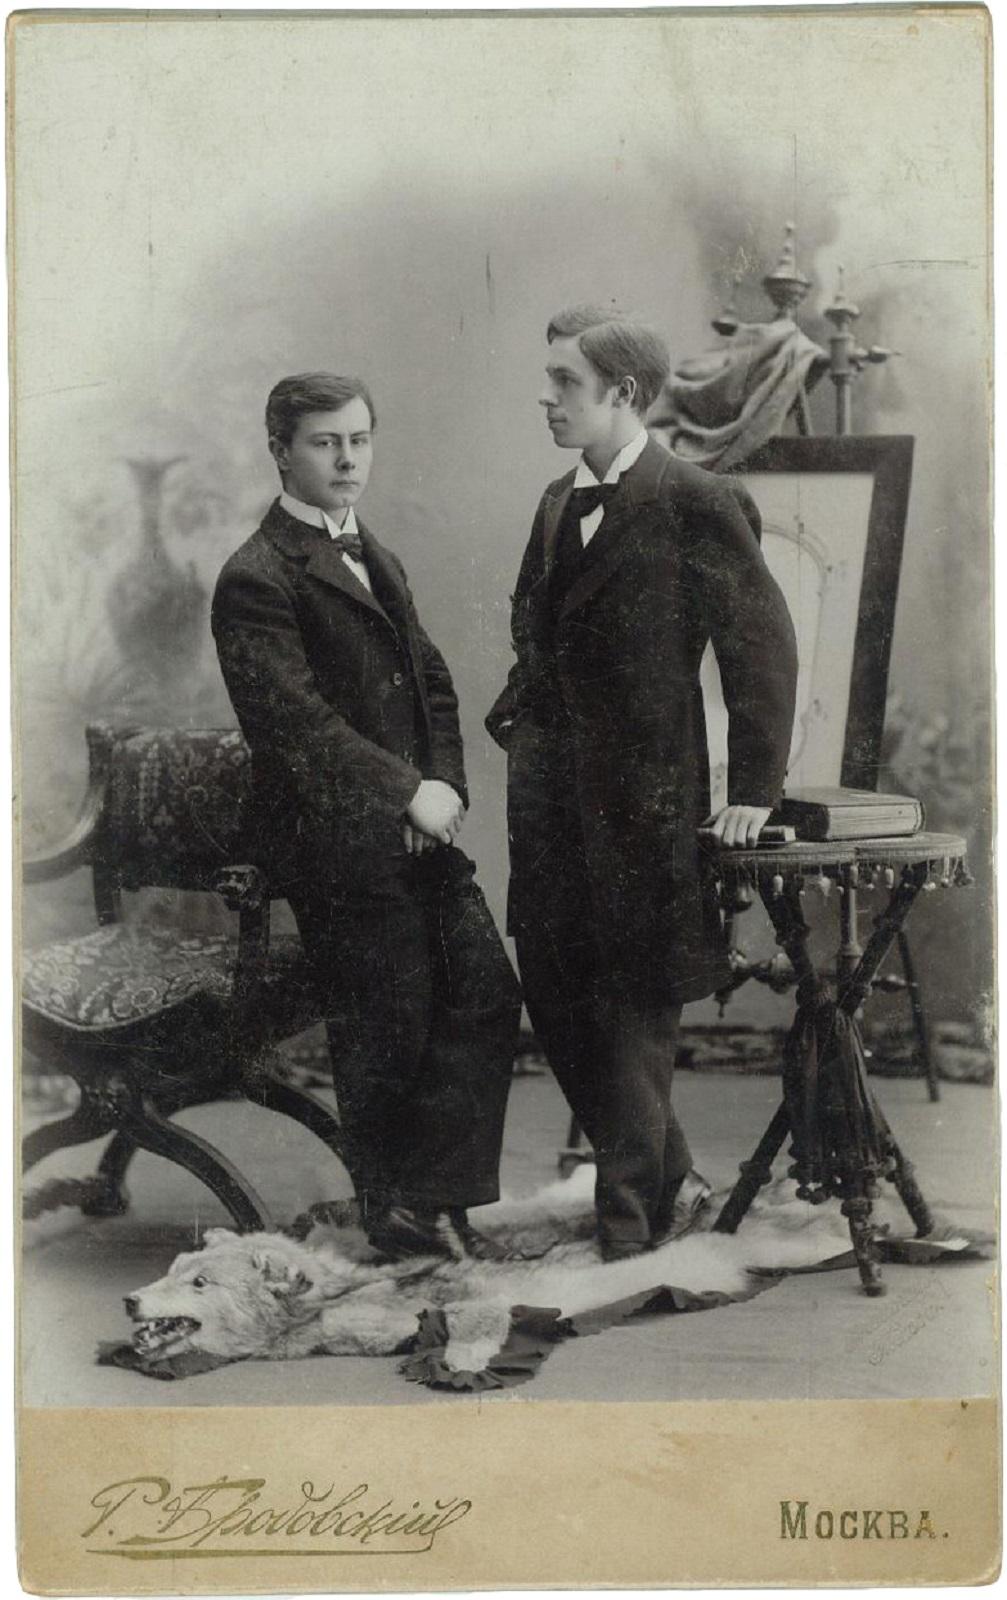 19. 1892. Пианист Гофман Иосиф Казимир и Скрябин Александр Николаевич